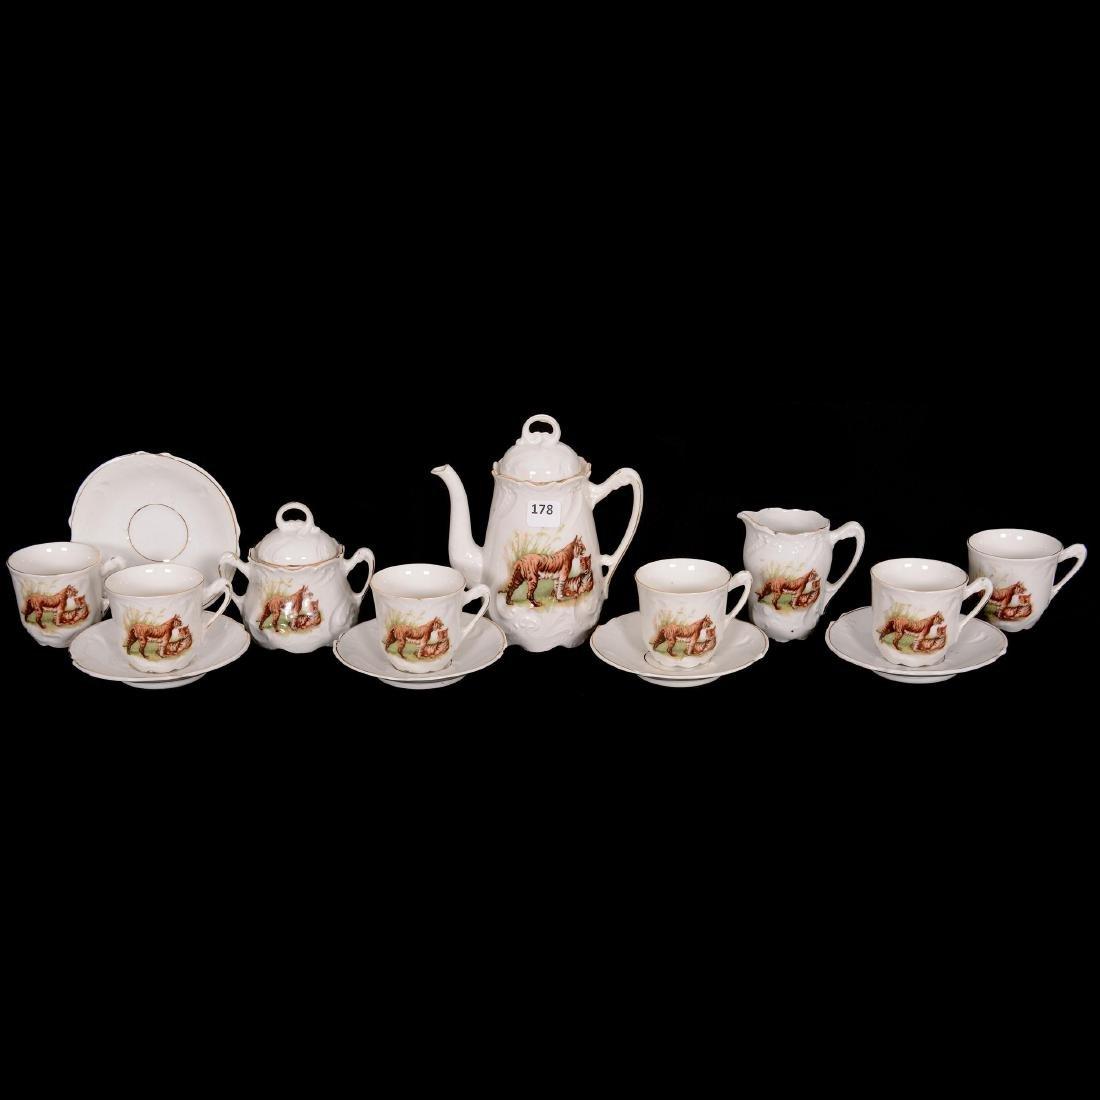 Rare Unmarked Germany Child's Tea Set